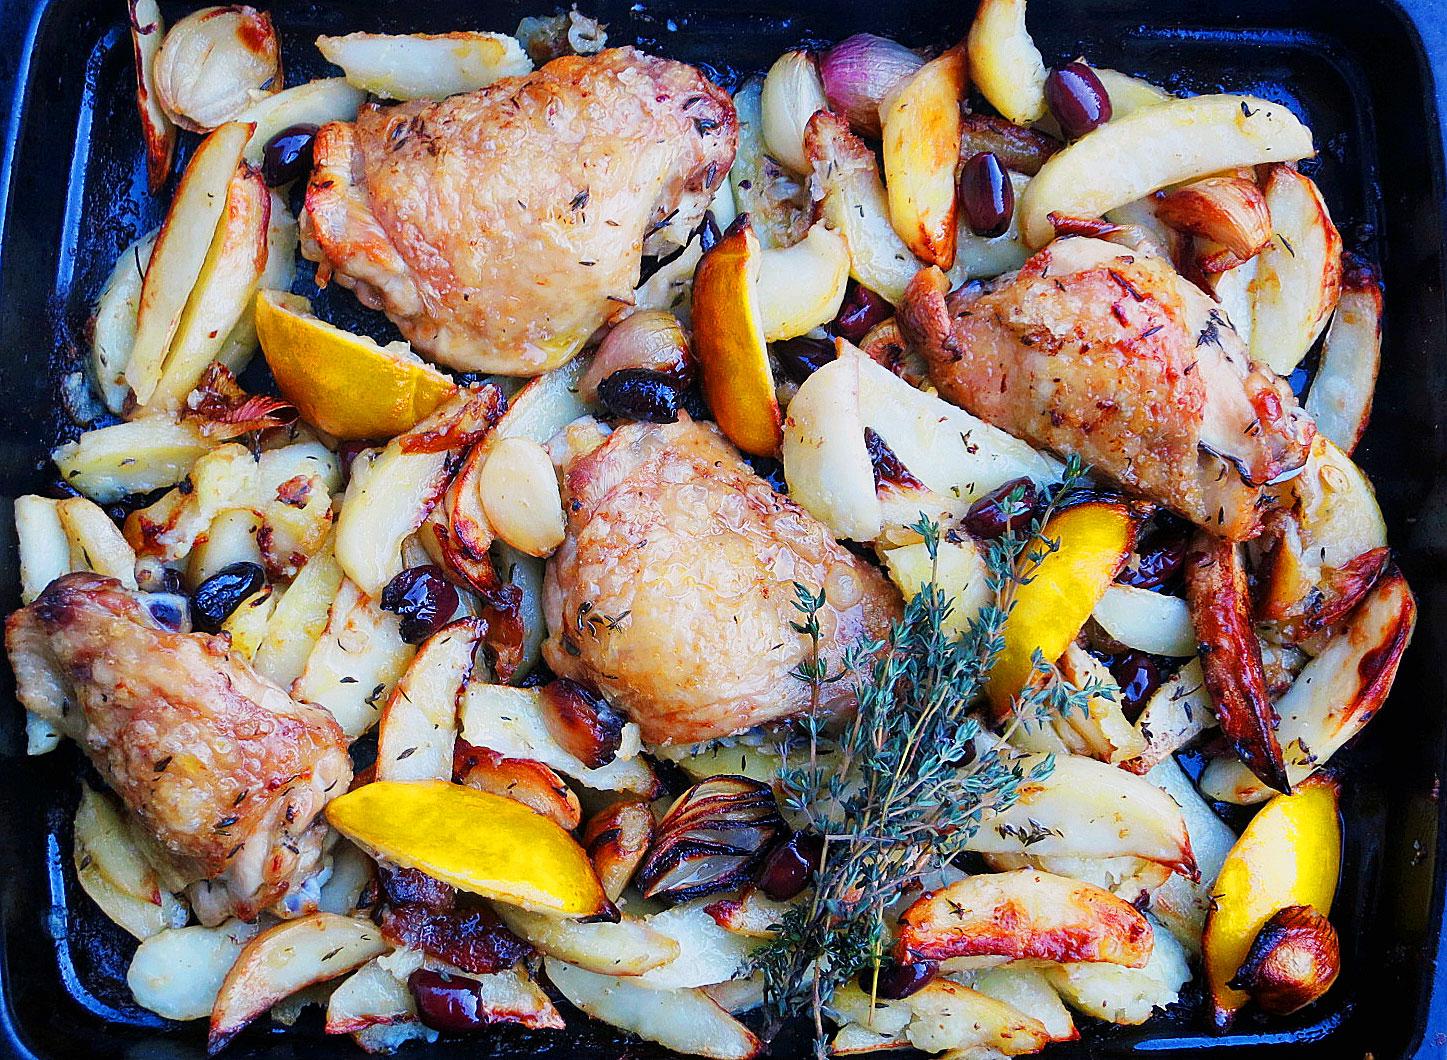 Roast chicken, lemon, potatoes, olives, shallots, garlic & thyme